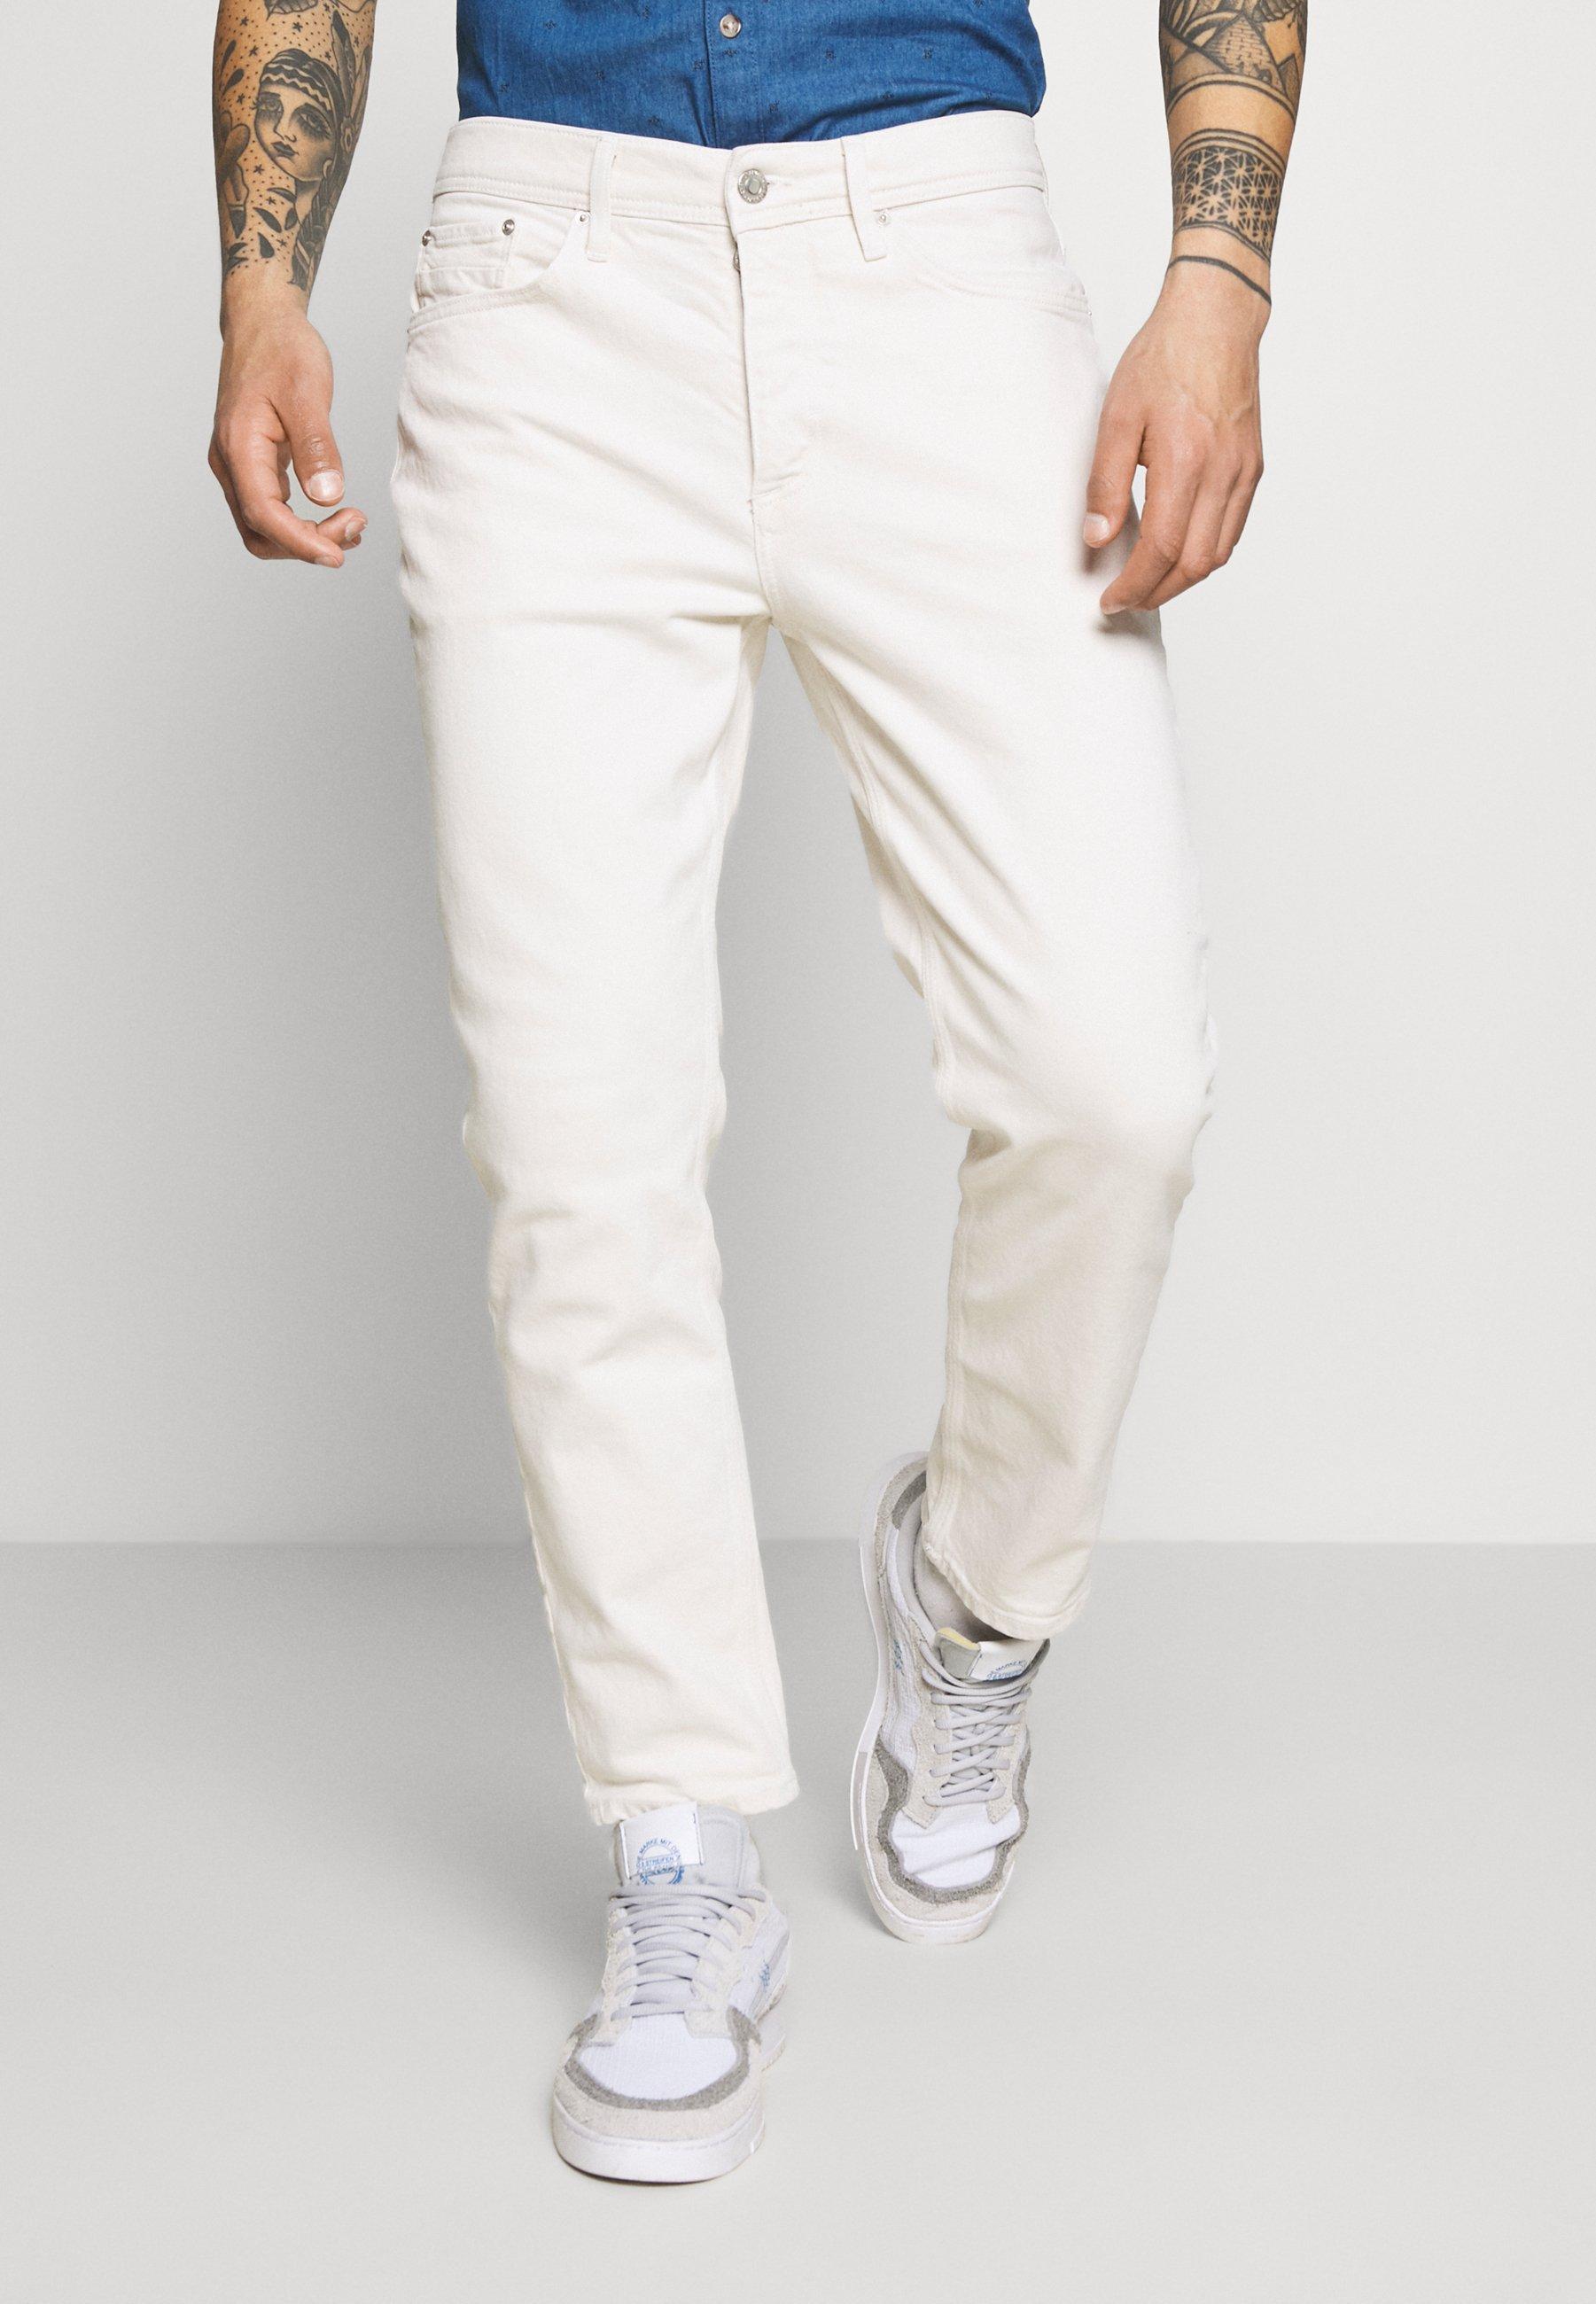 Men Jeans Skinny Fit